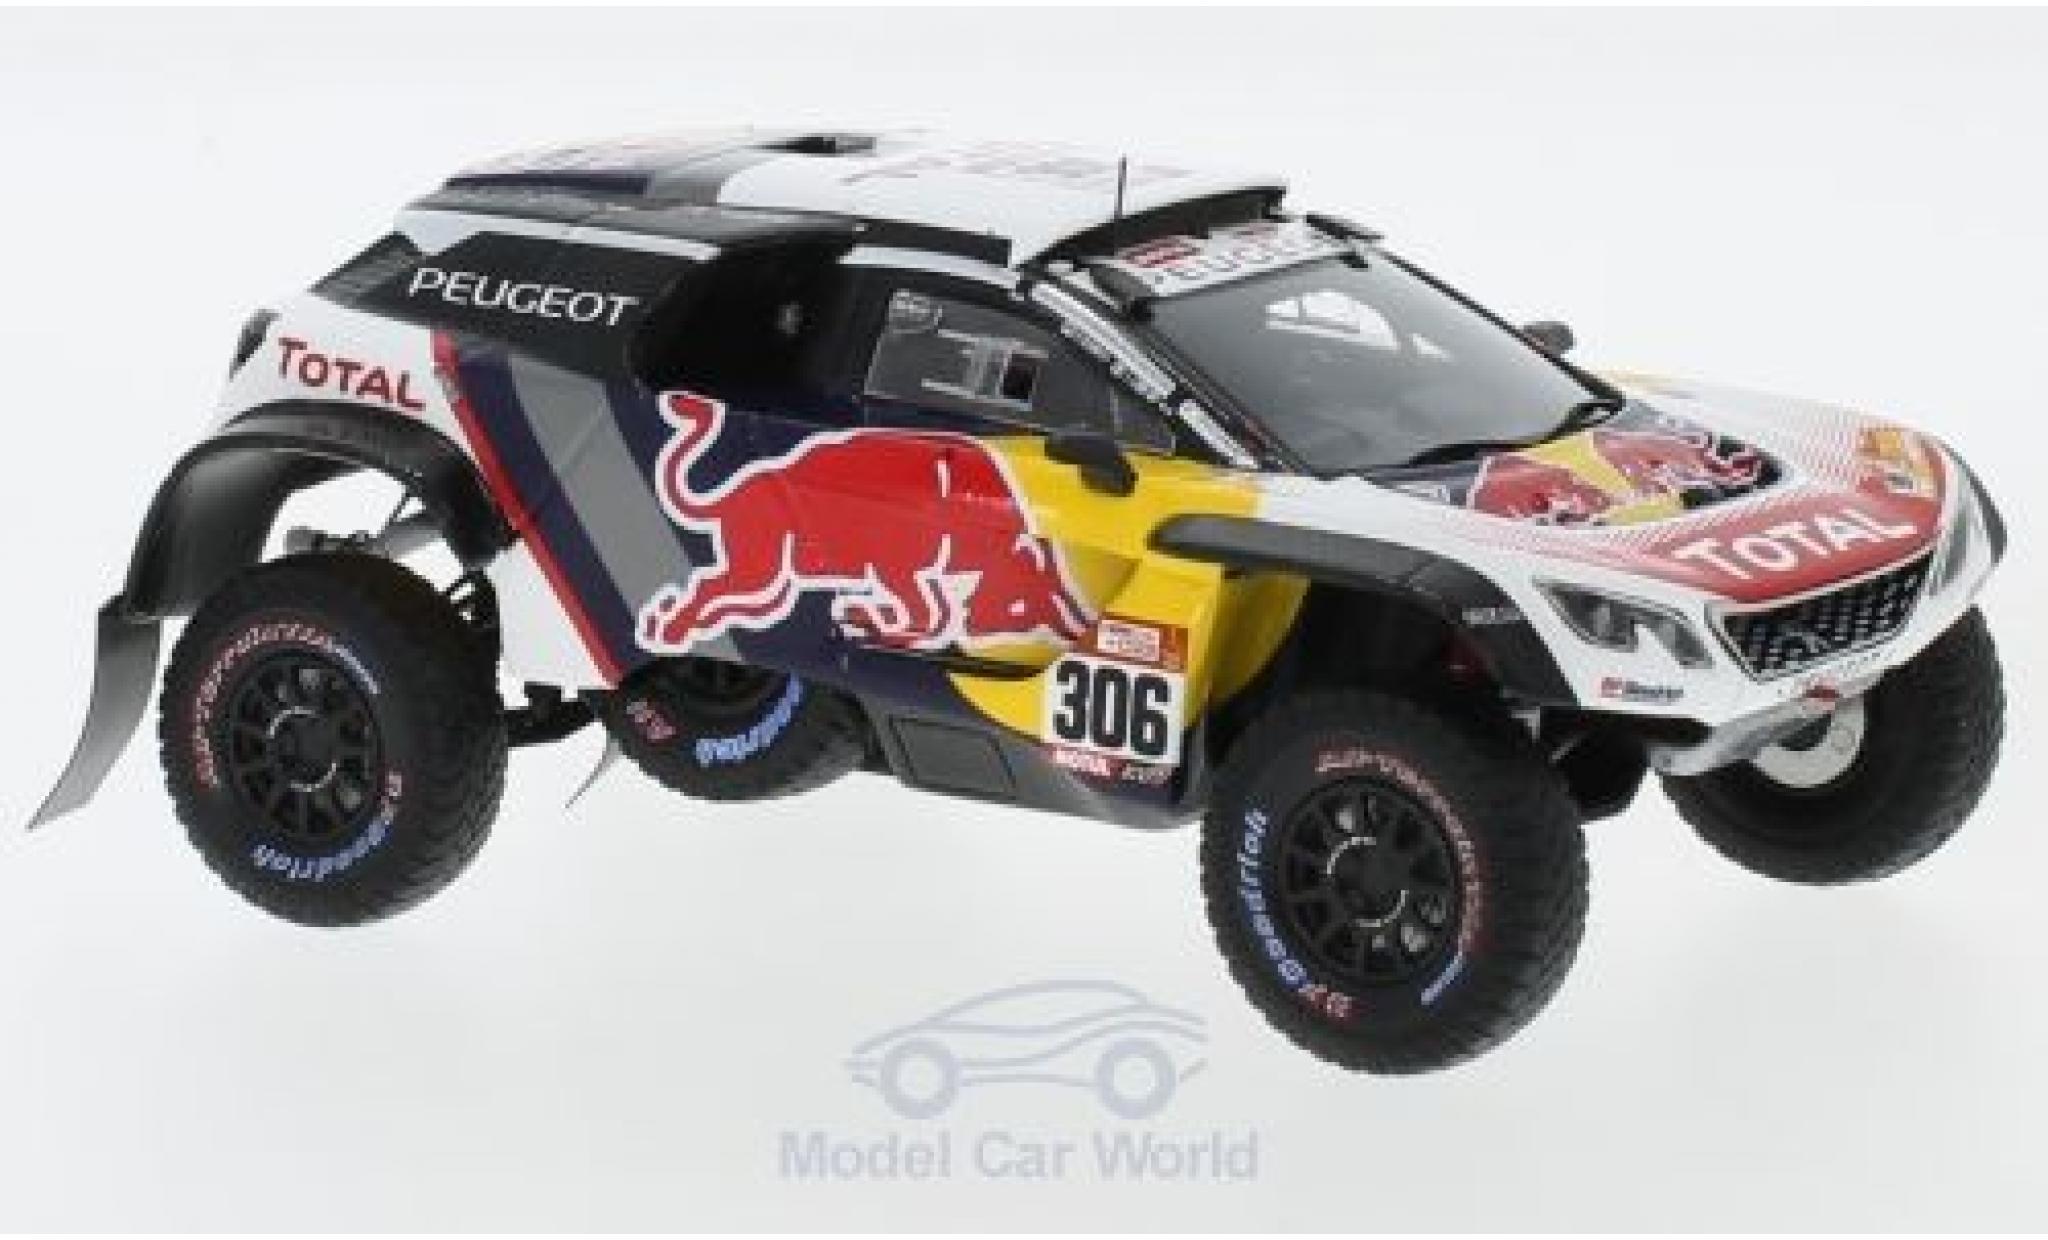 Peugeot 3008 1/43 Spark DKR Maxi No.306 Team Total Rallye Dakar 2018 S.Loeb/D.Elena